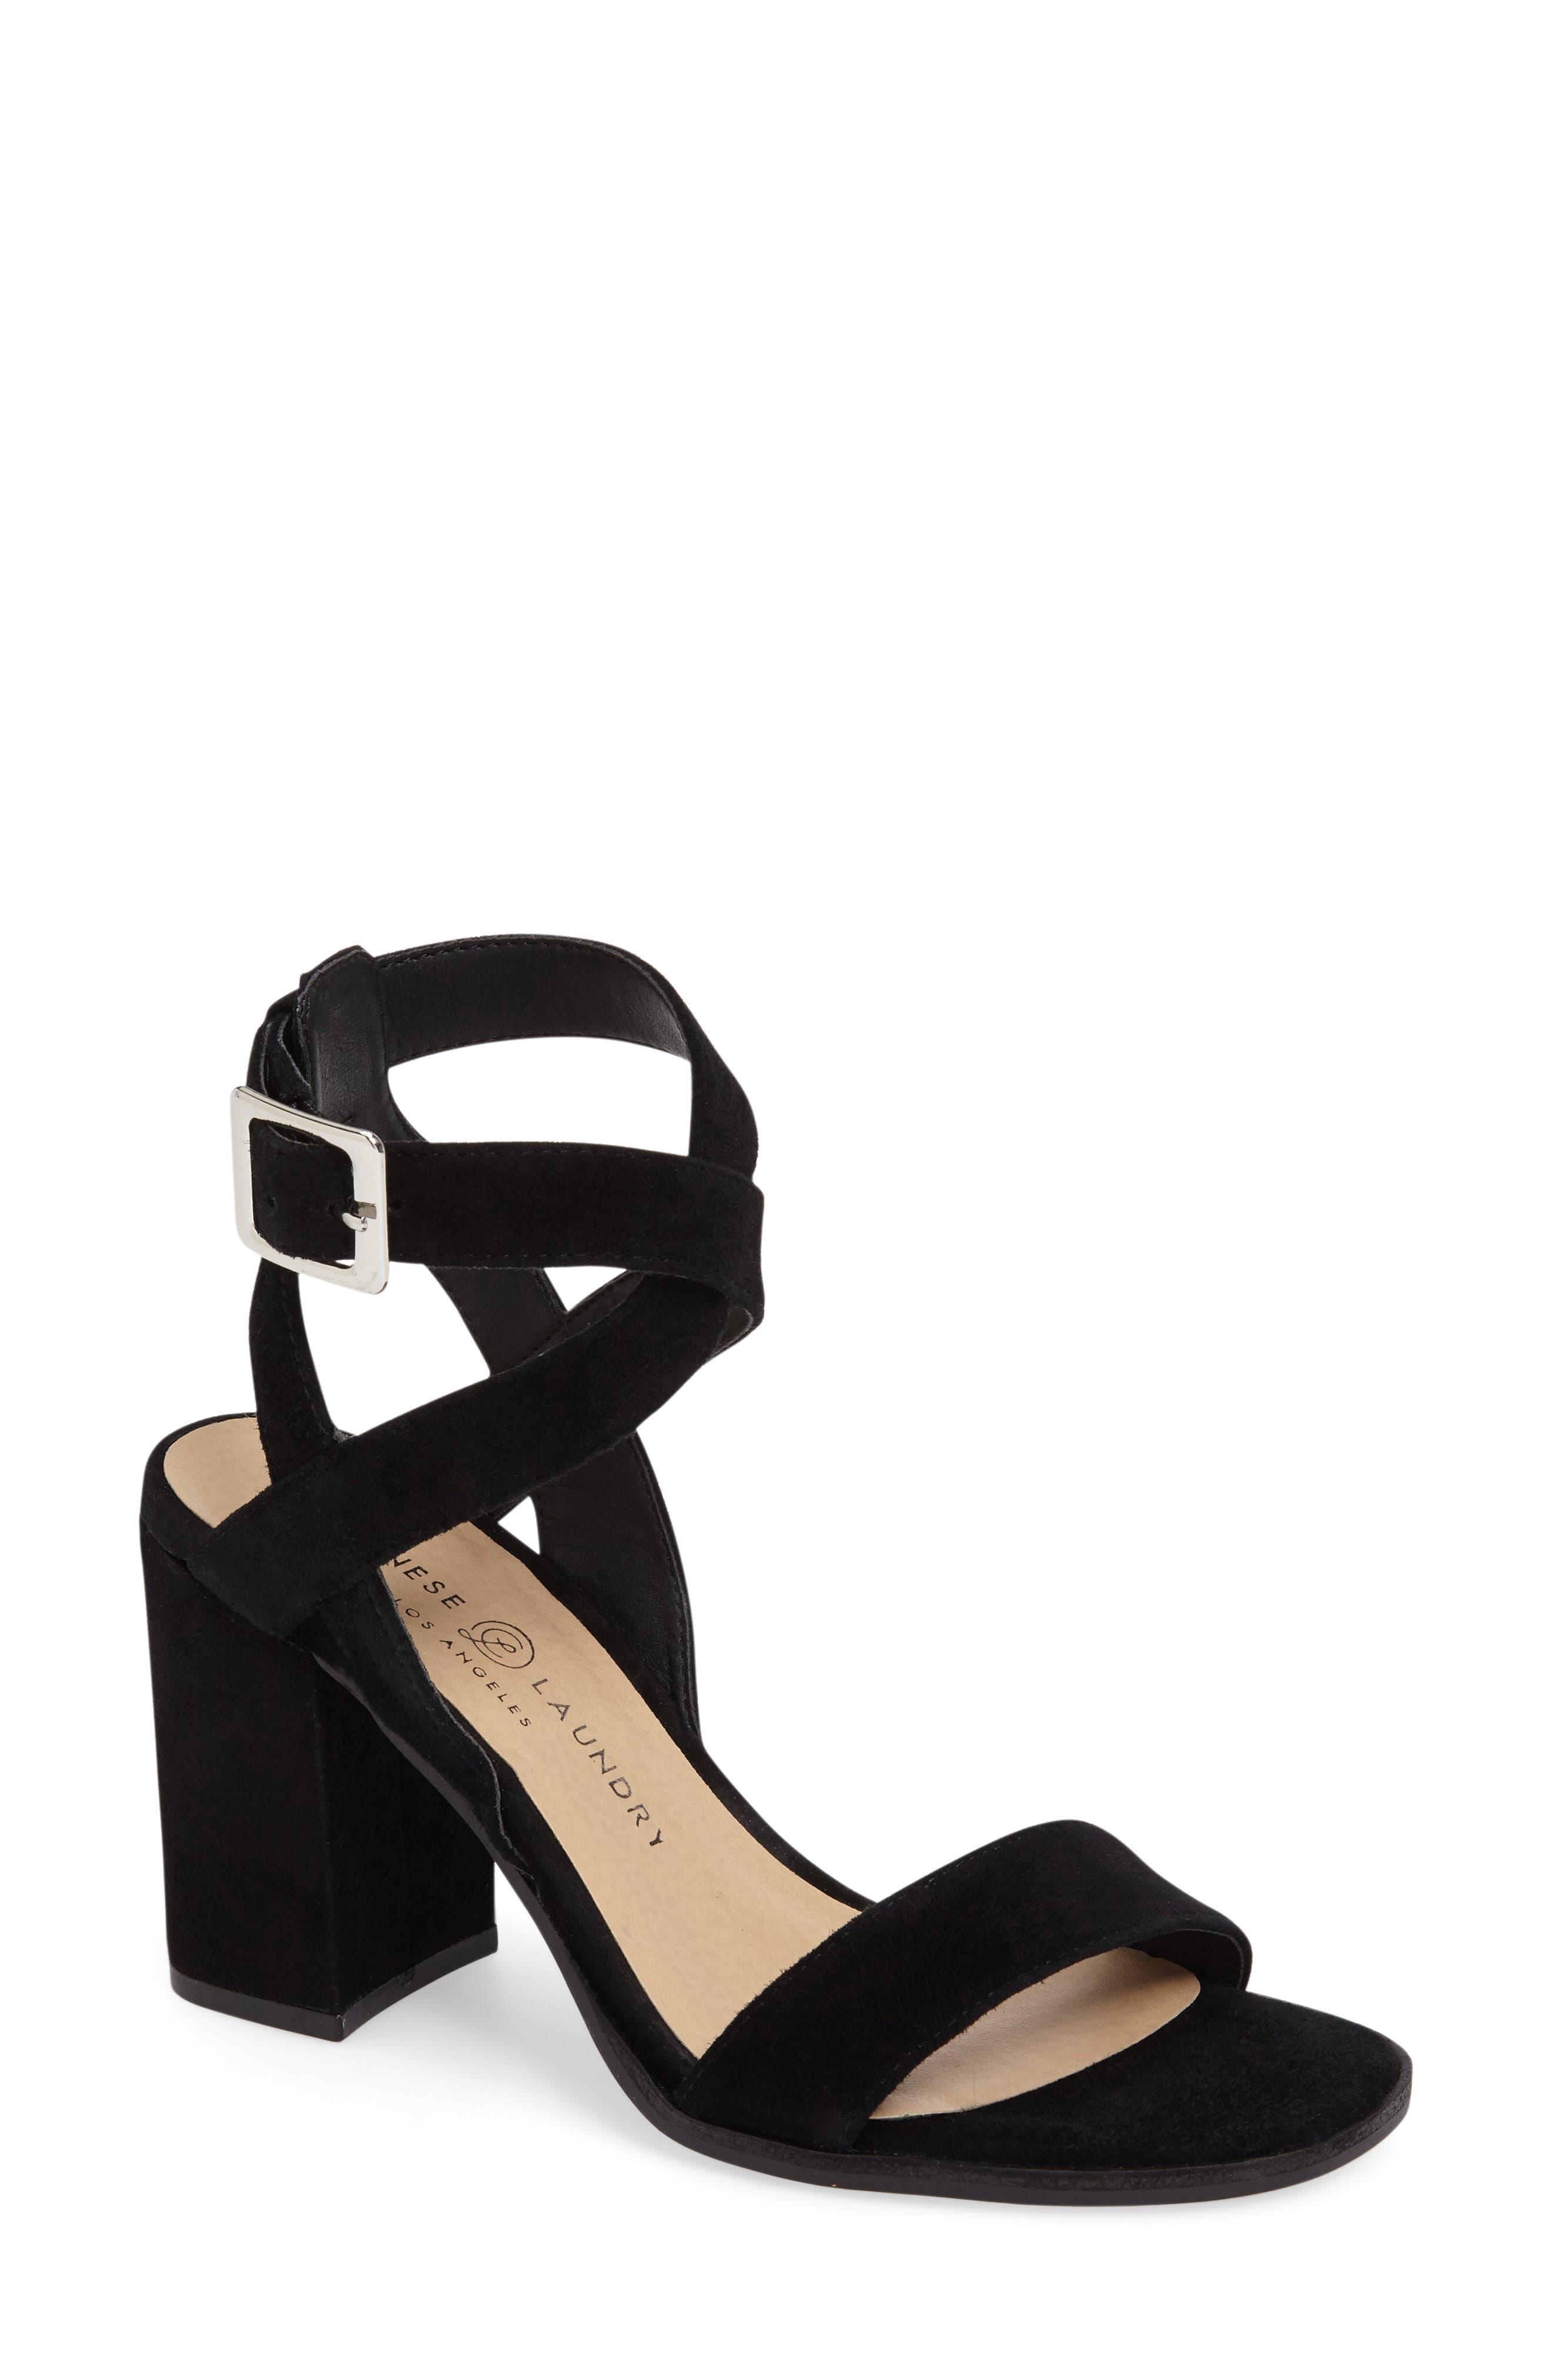 Sitara Ankle Strap Sandal,                         Main,                         color, Black Suede